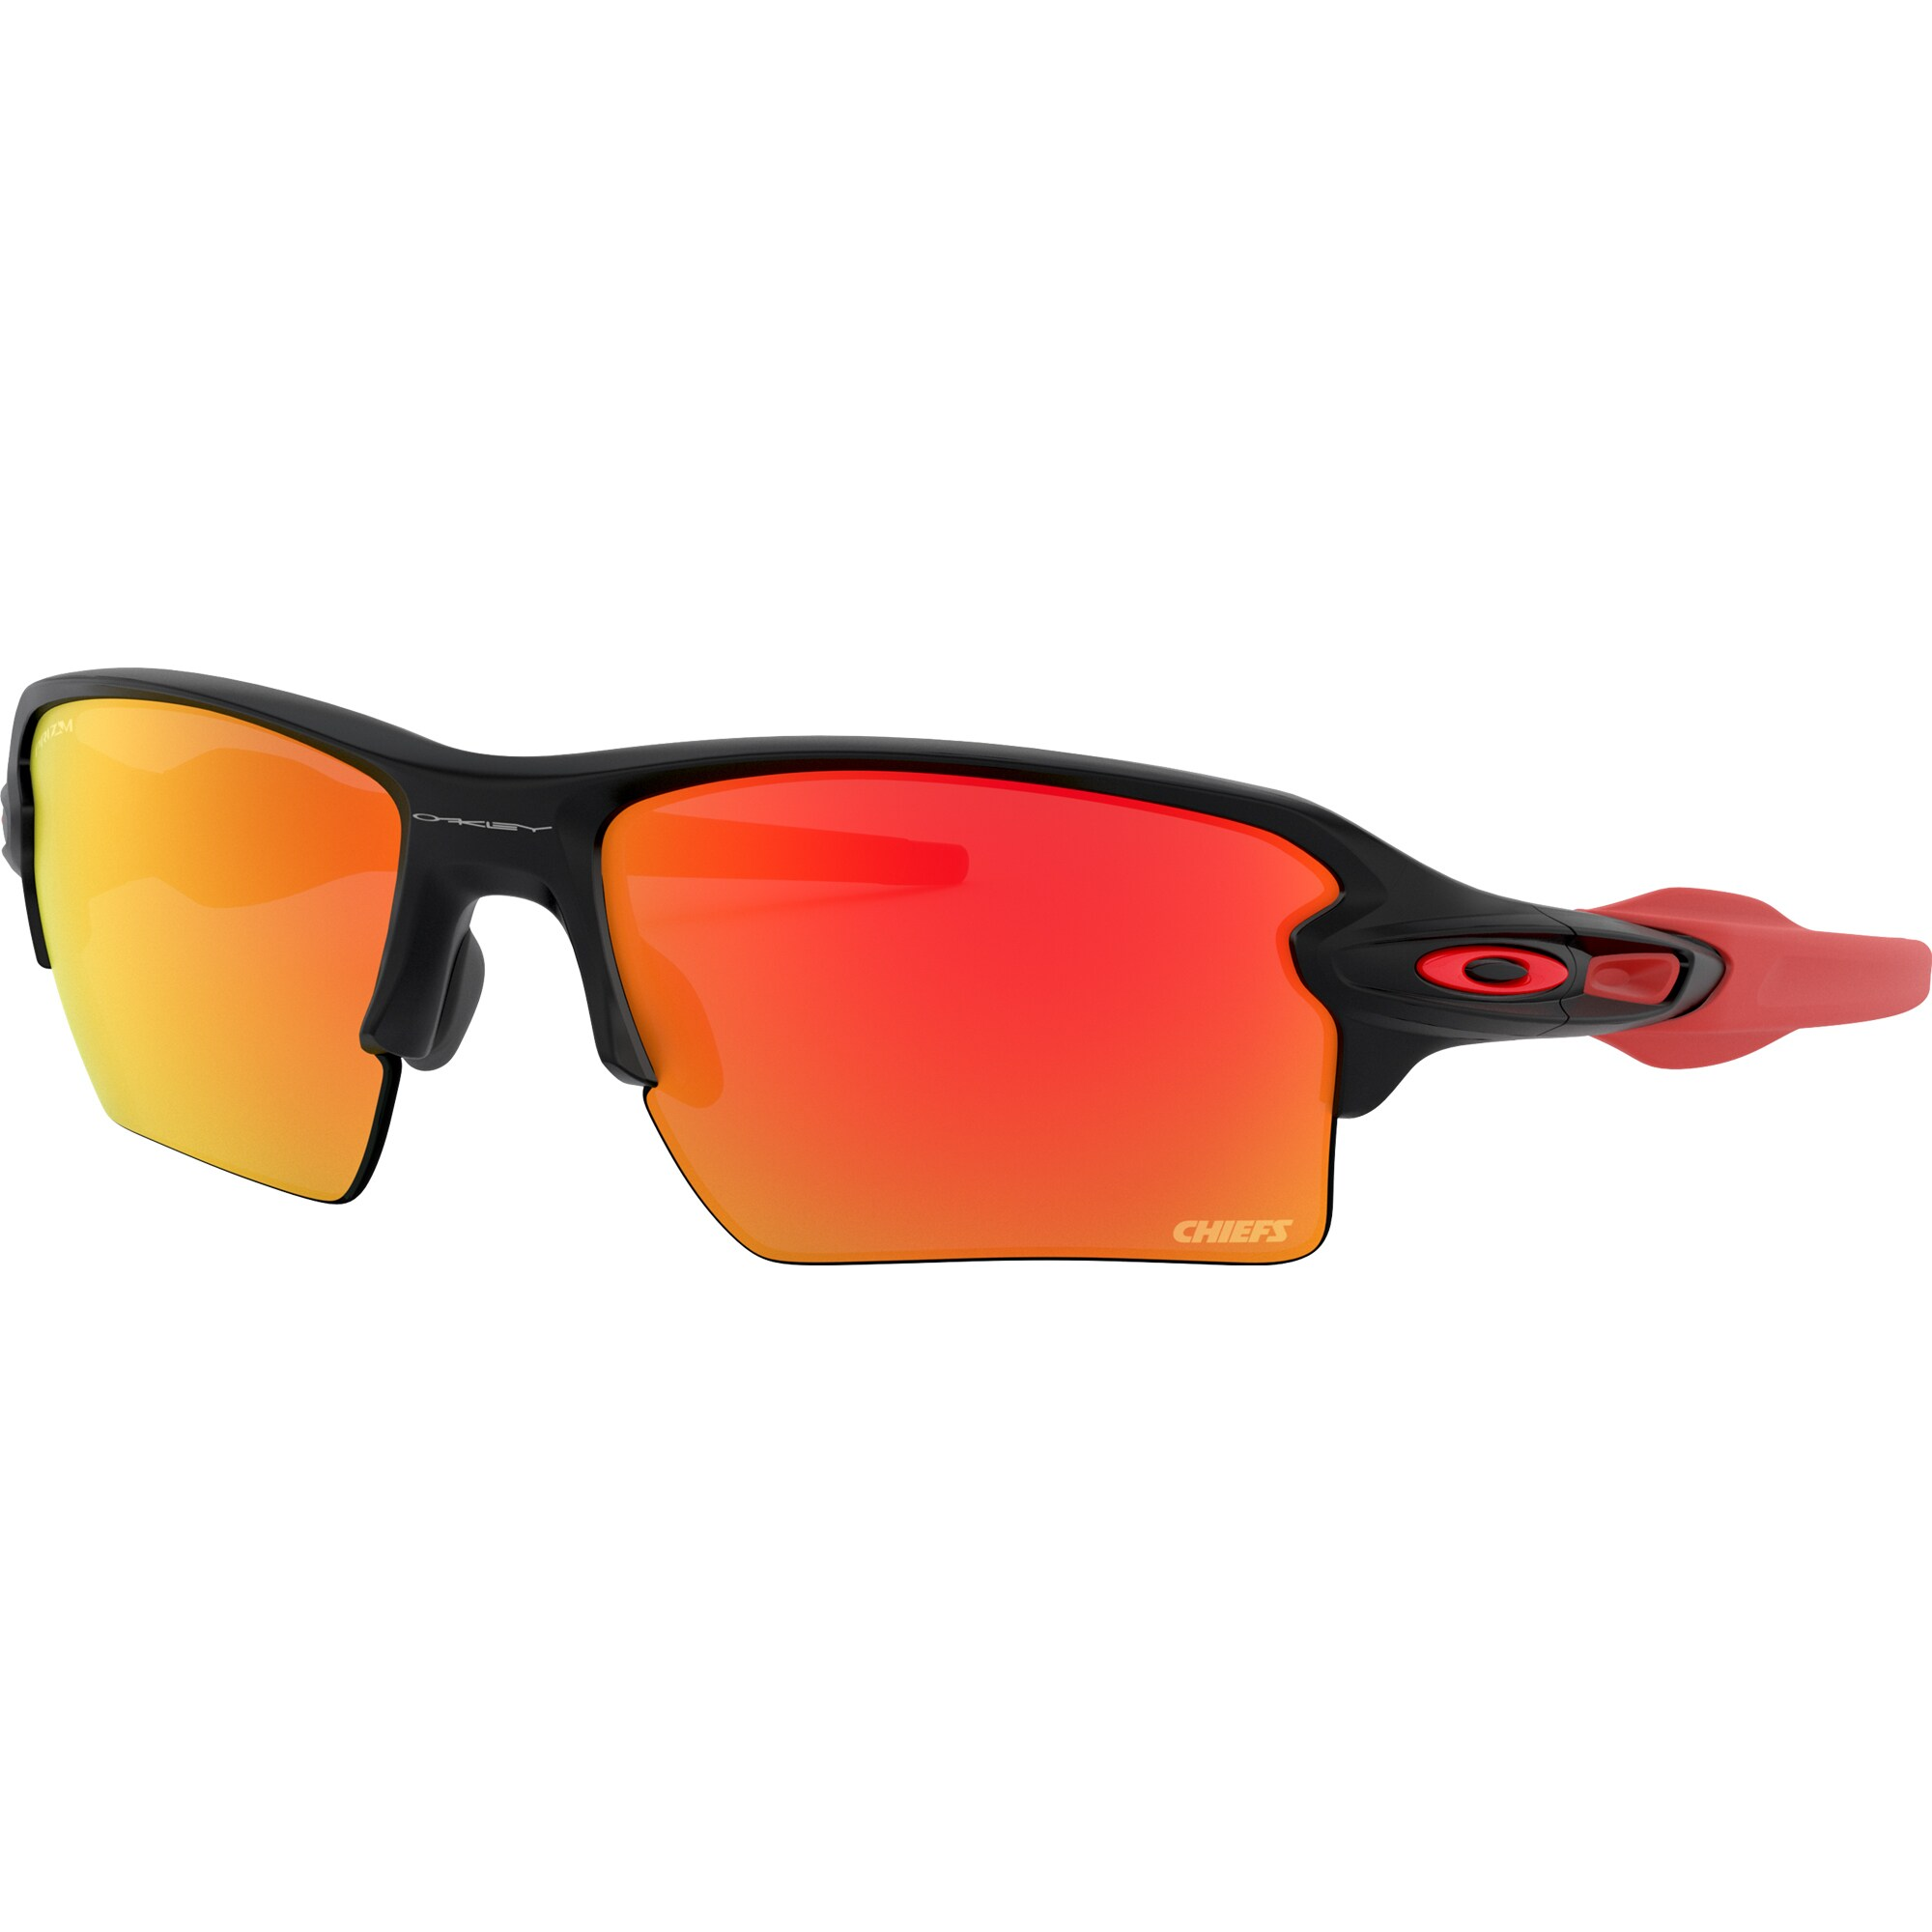 Kansas City Chiefs Oakley Flak 2.0 XL Sunglasses